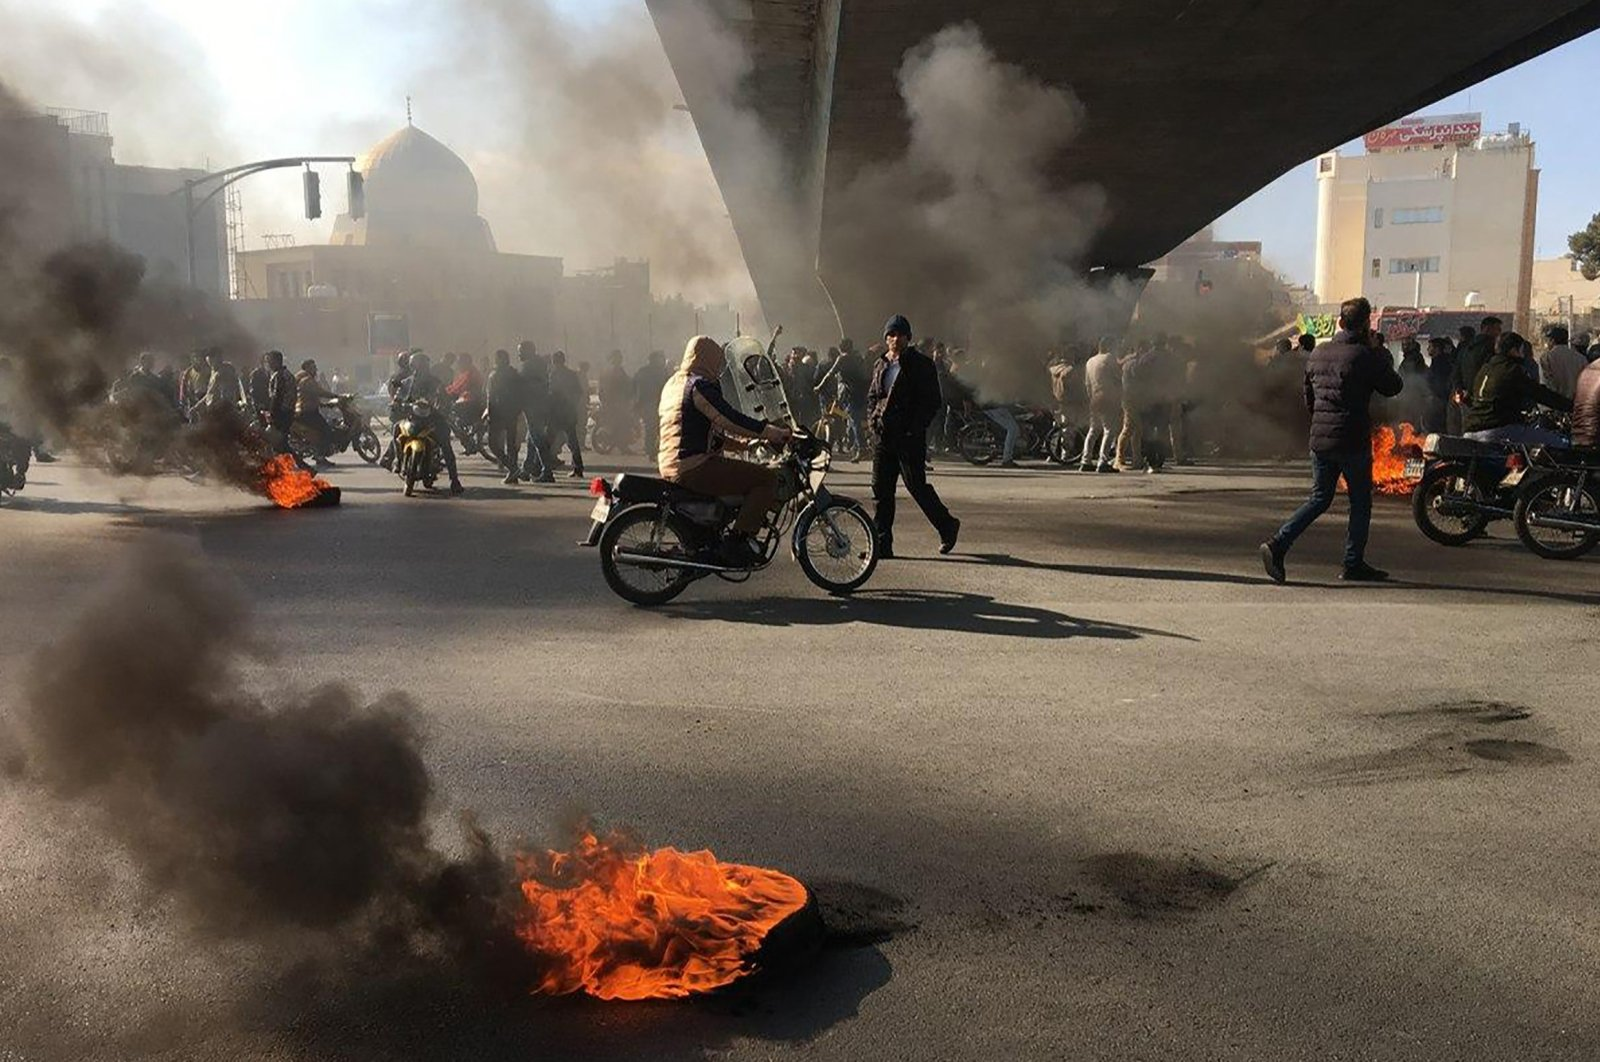 Iranian protesters rally amid burning tires during a demonstration, Isfahan, Iran, Nov. 16, 2019. (AFP Photo)